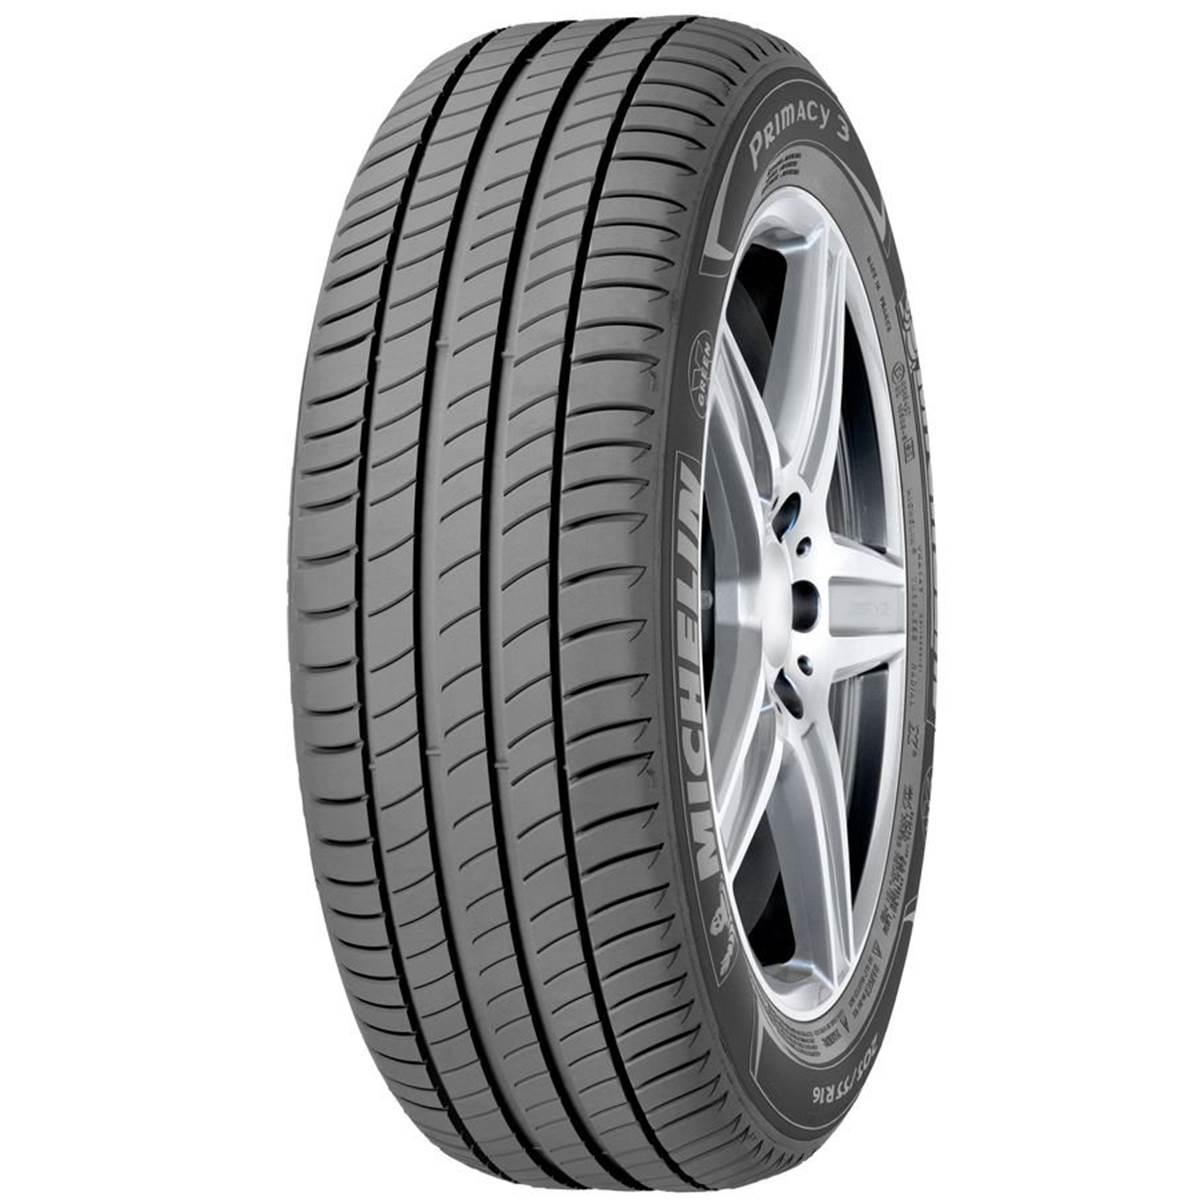 Pneu Michelin 245/45R18 96W Primacy 3